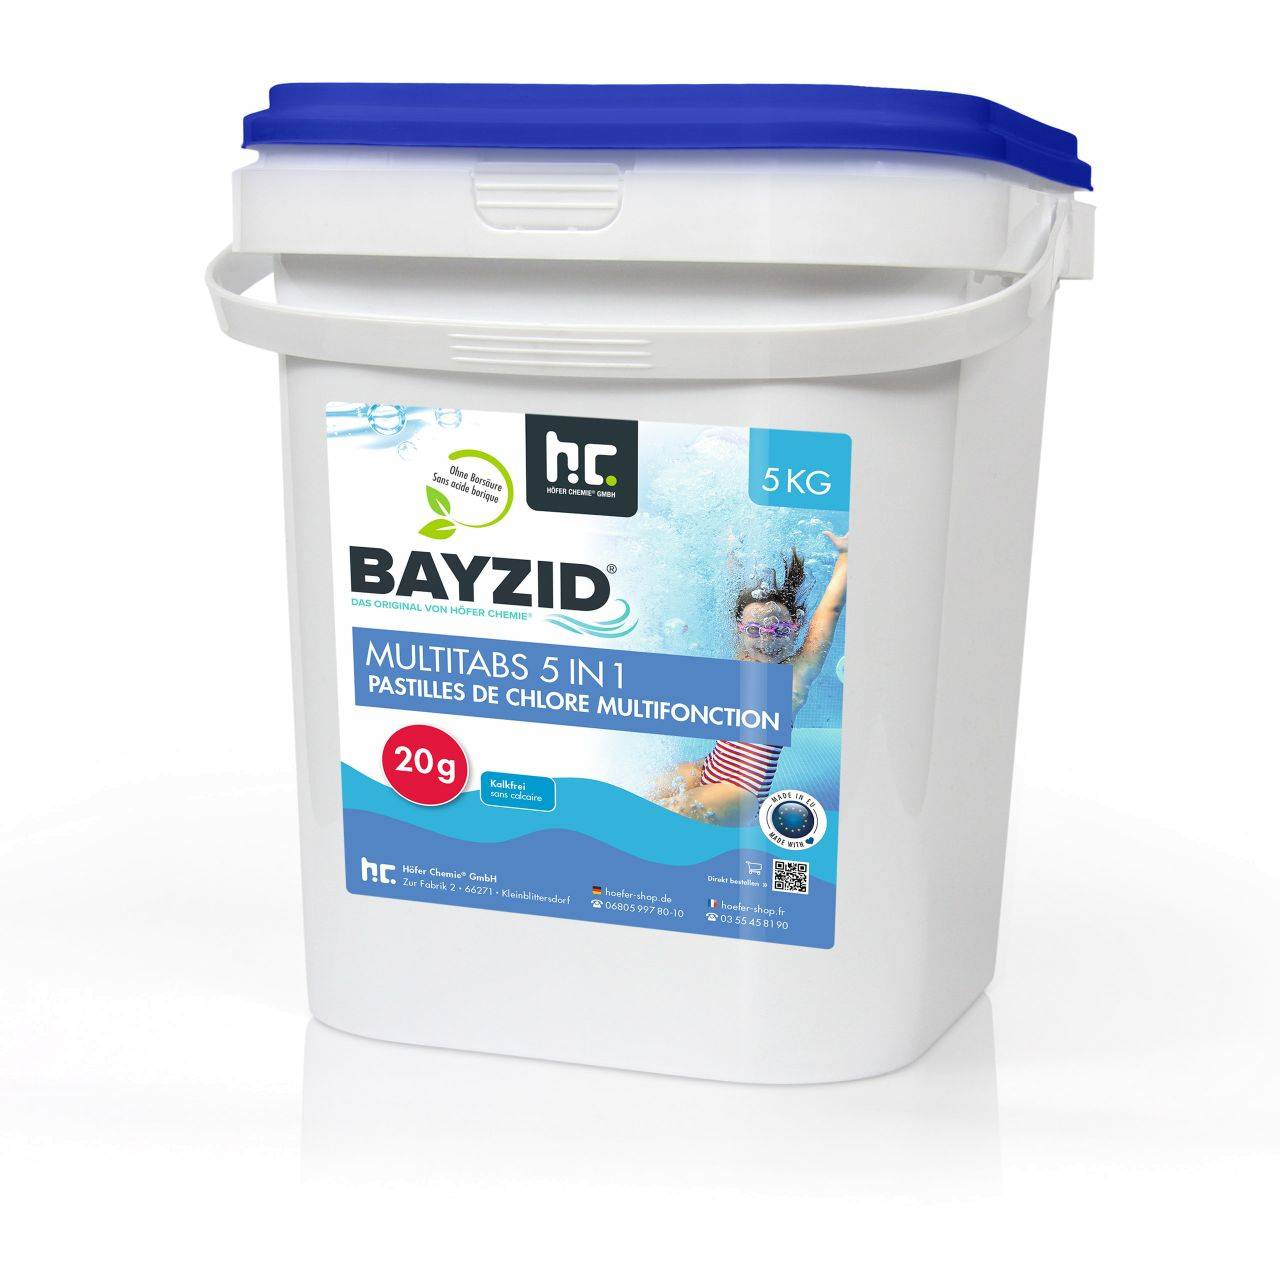 BAYZID 10 kg Bayzid® Pastilles de chlore multifonction (20g) (2 x 5 kg)